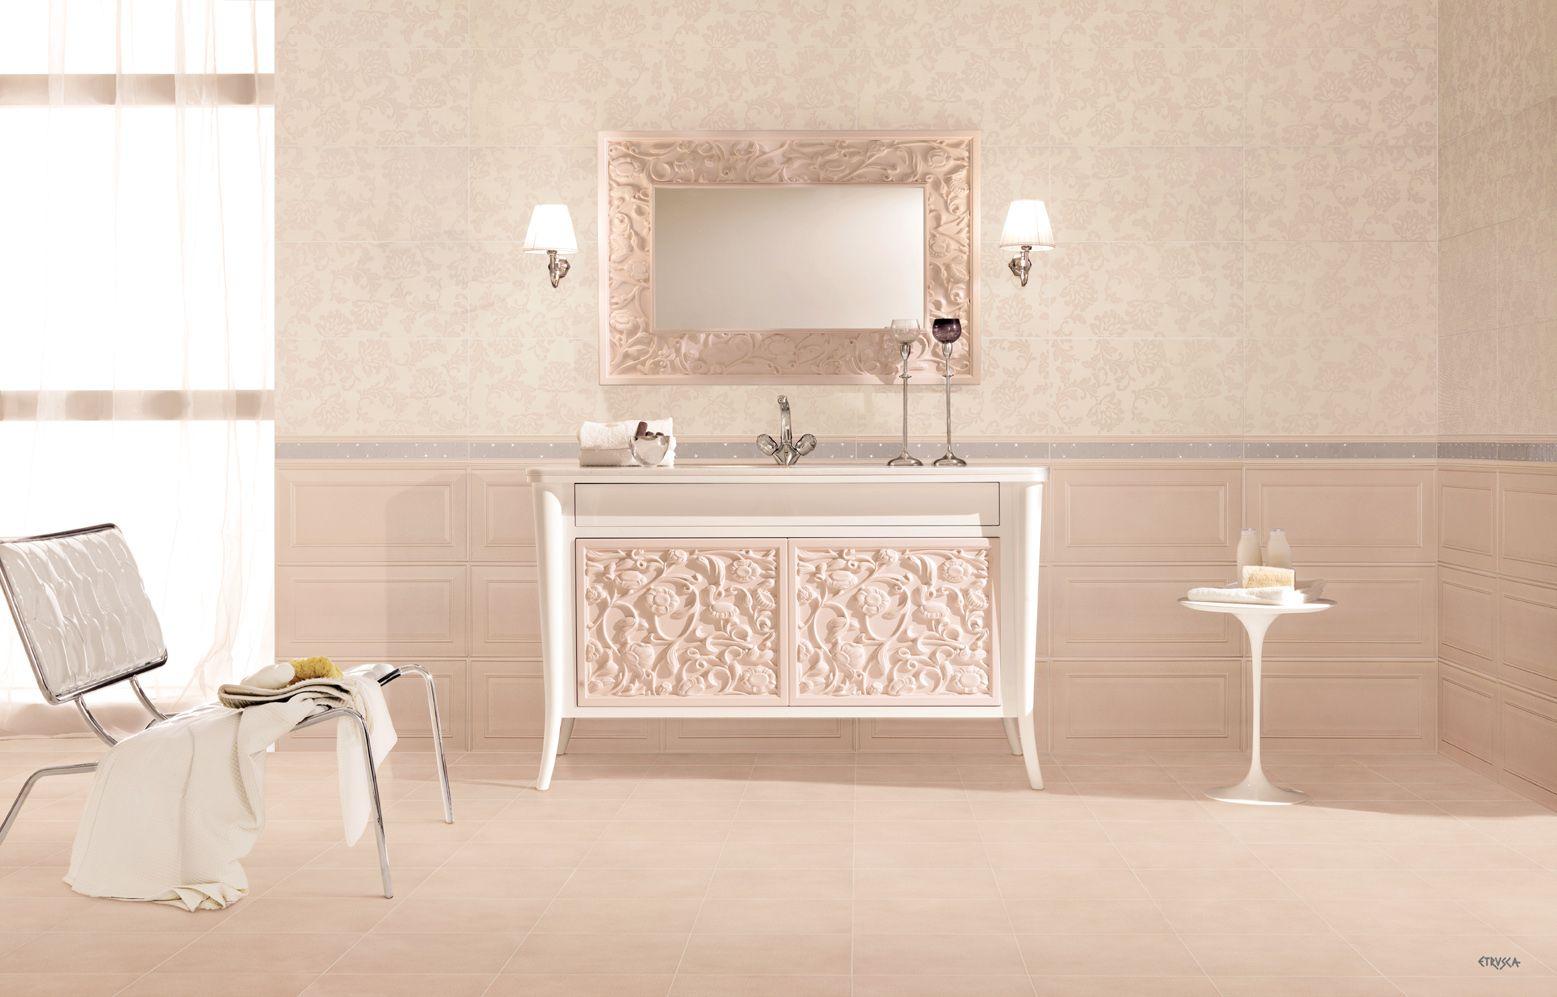 Piemme Valentino Linea Boiserie - | Charmant | Pinterest | Showroom